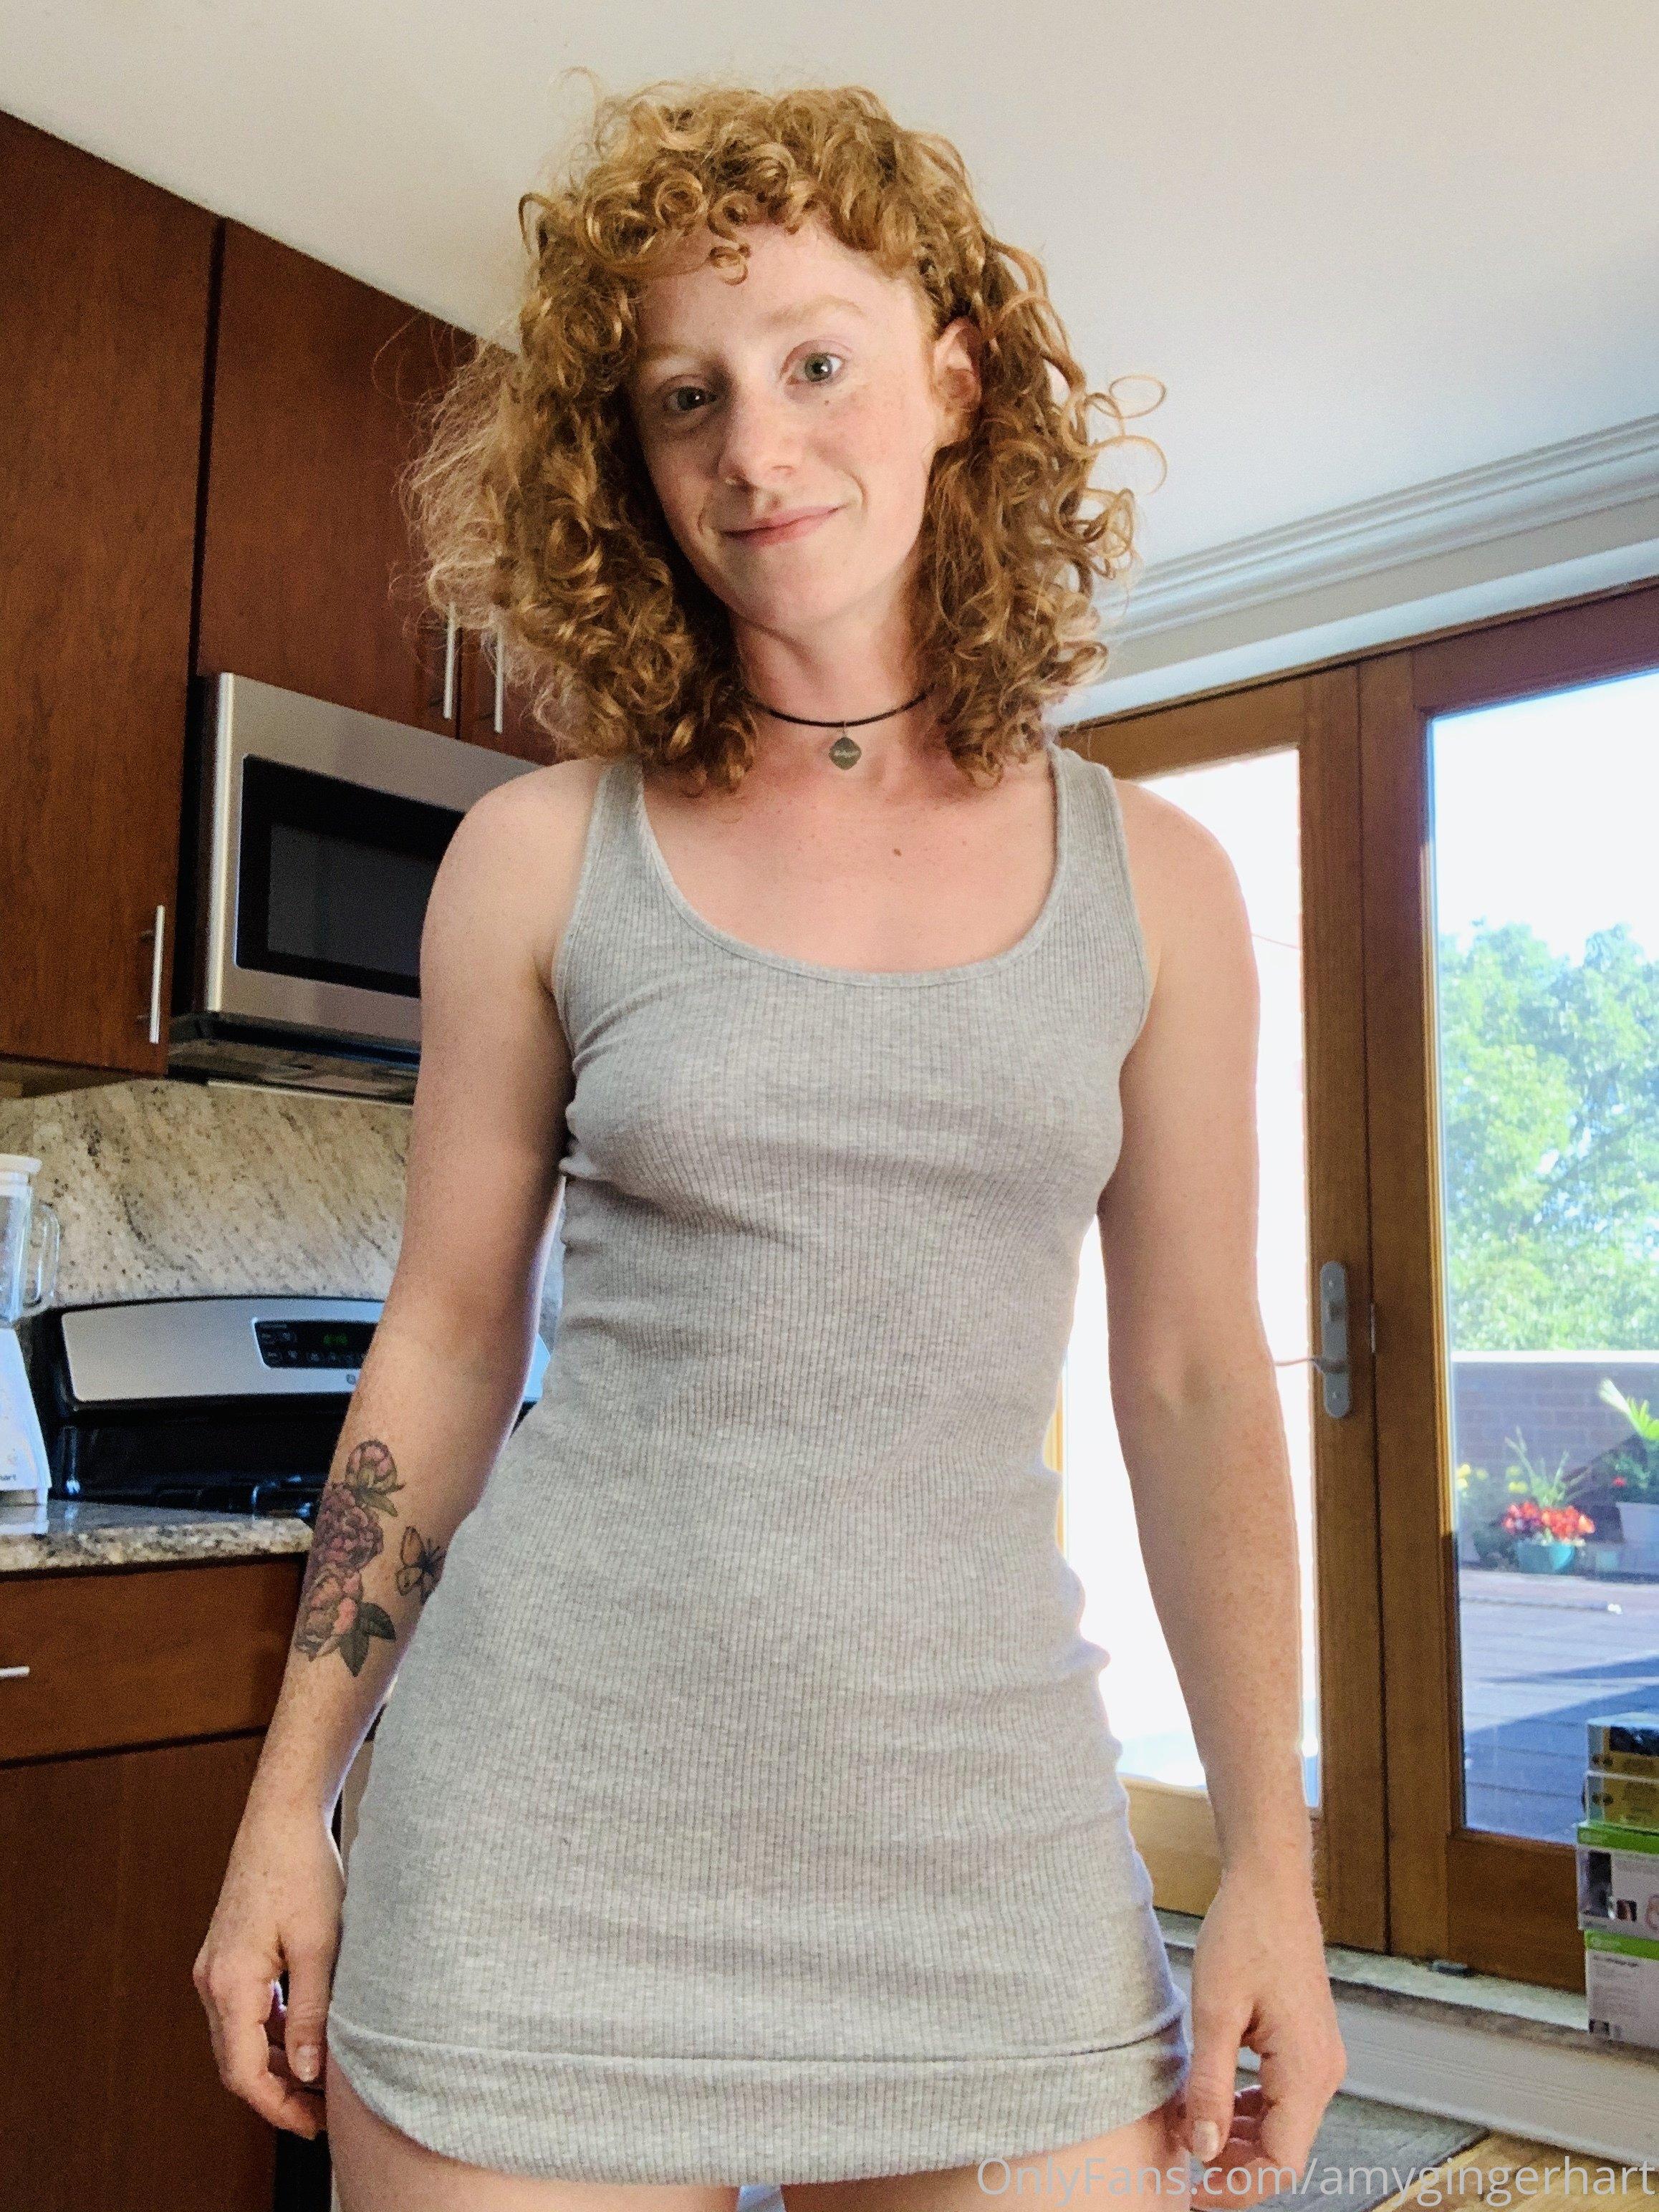 Amy Hart, Amygingerhart, Onlyfans 0039